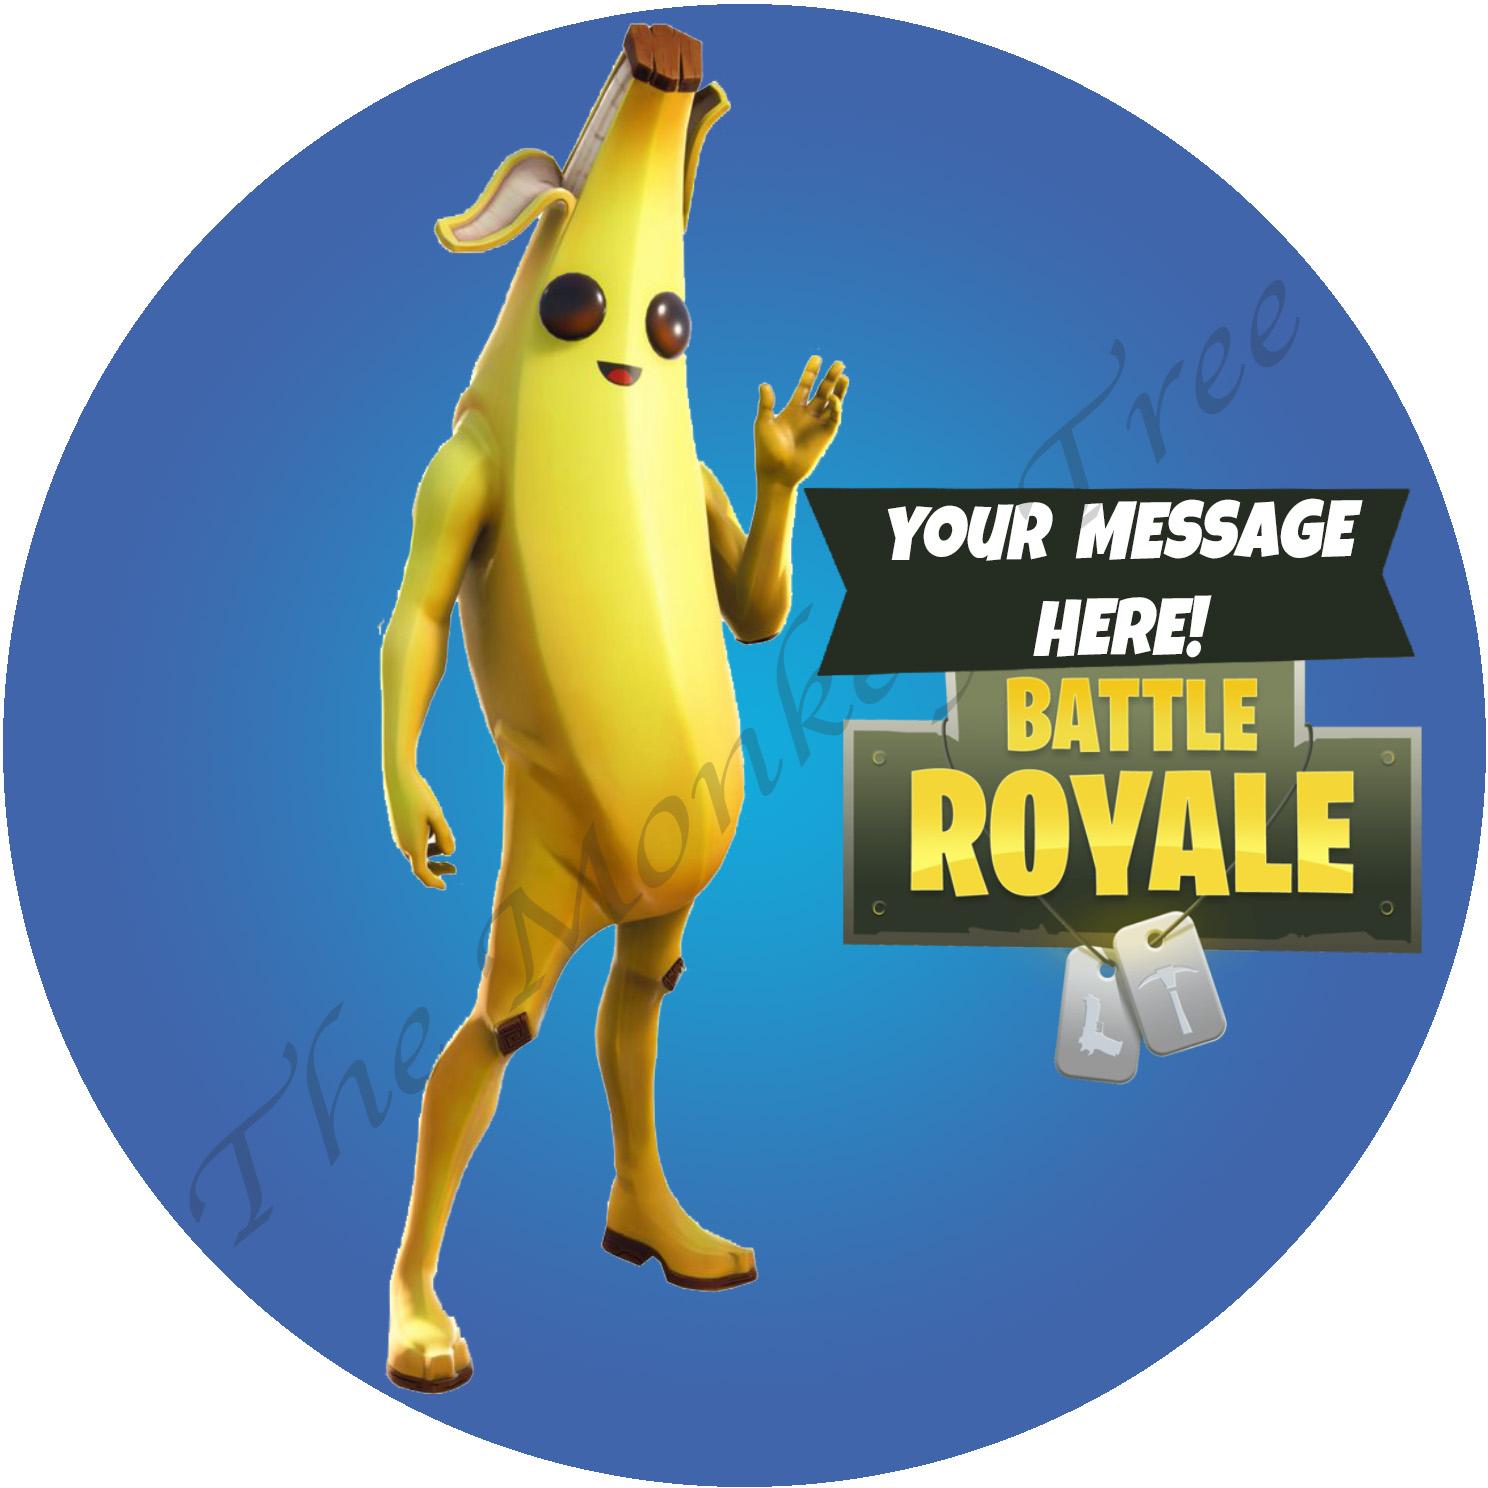 Fortnite Seasons Peely Fortnite Peely Banana Edible Cake Image Topper The Monkey Tree